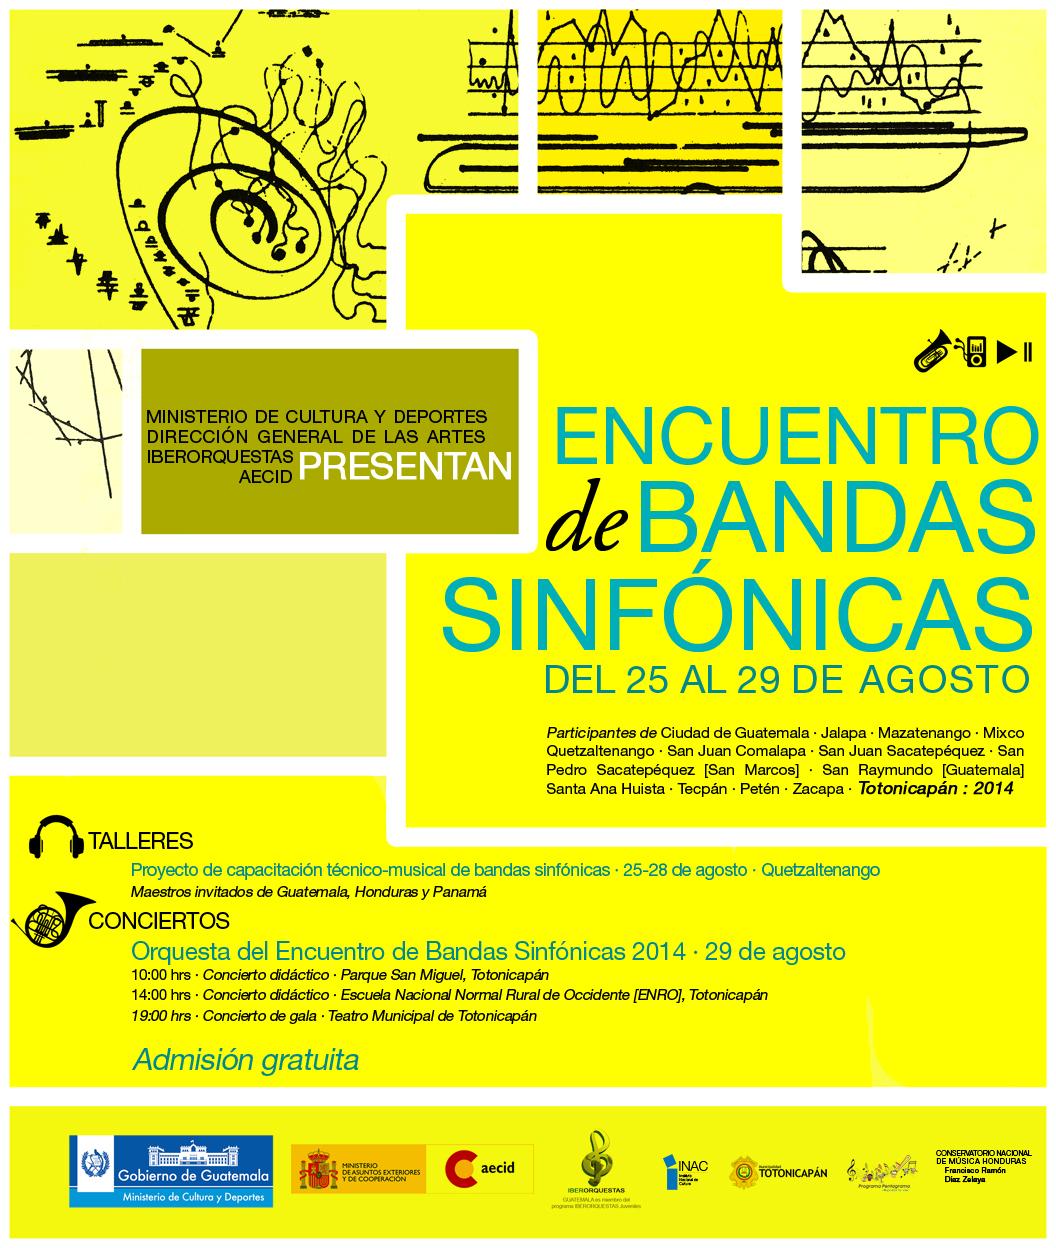 Encuentro de bandas sinfónicas, Toto2014 - Web